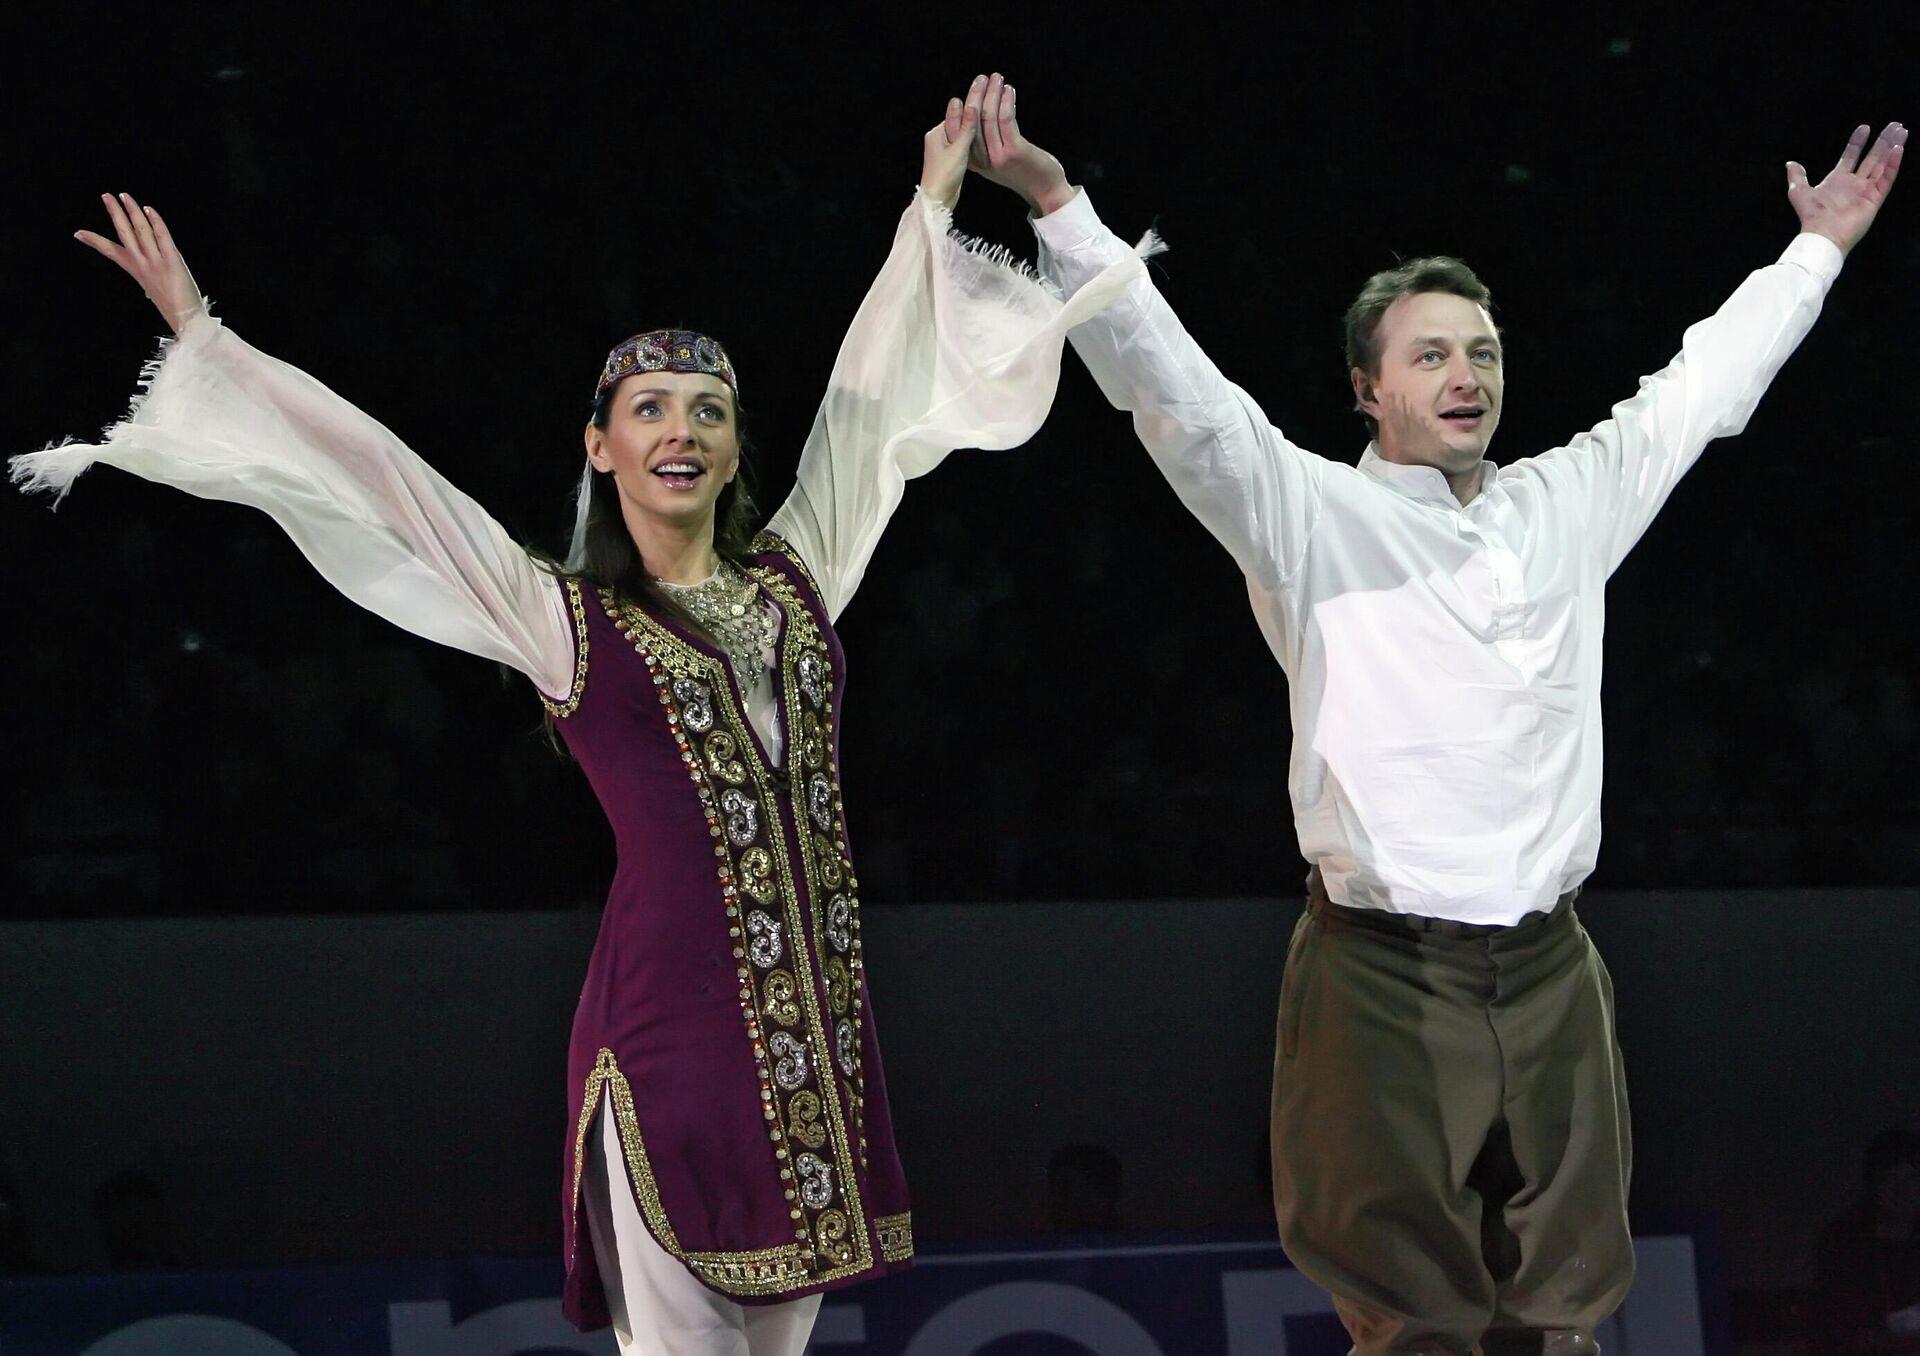 Татьяна Навка и актер Марат Башаров - РИА Новости, 1920, 23.11.2020